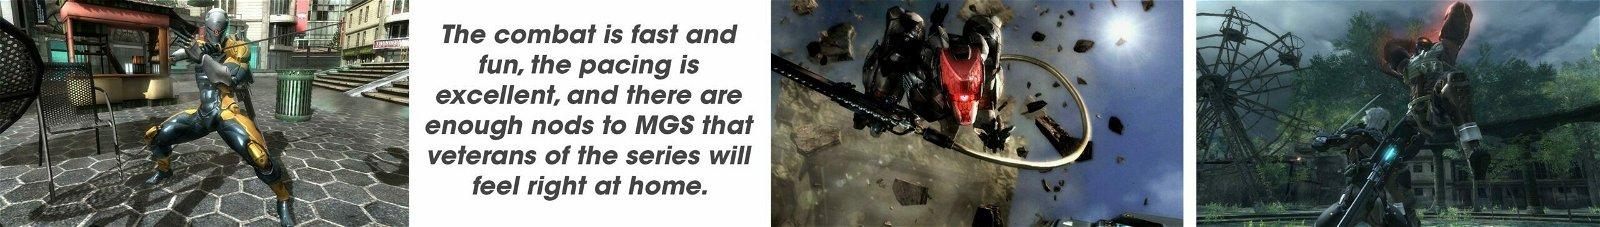 Metal_Gear_Banner.jpg